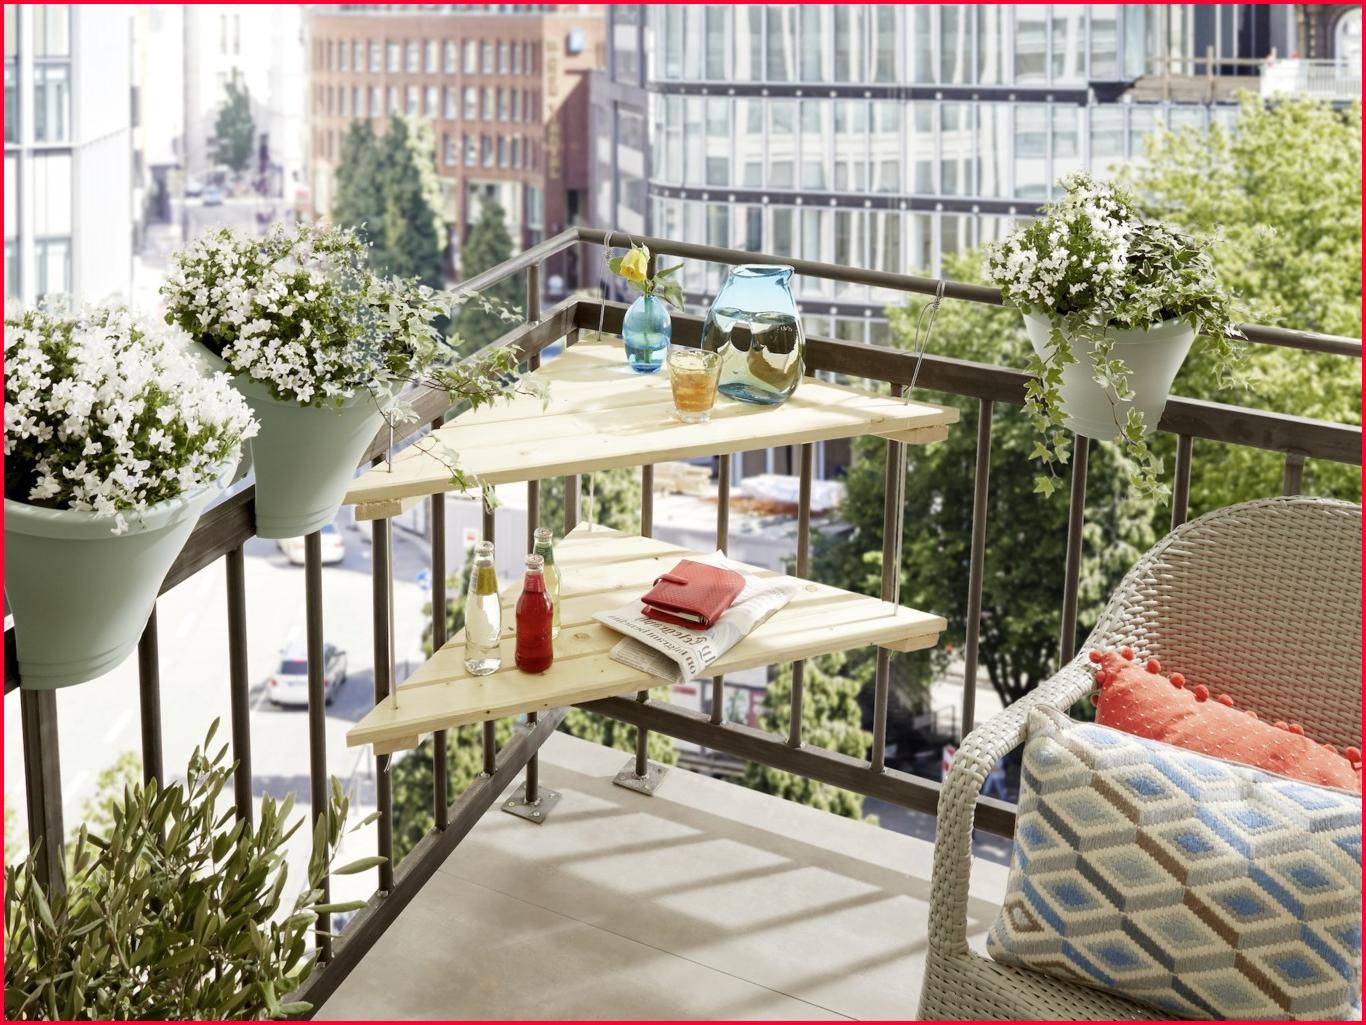 Mesa Y Sillas Para Balcon Pequeño Ftd8 Mesa Para Balcon Mesa En Esquina Para Un BalcN Hazlo Tu Mismo